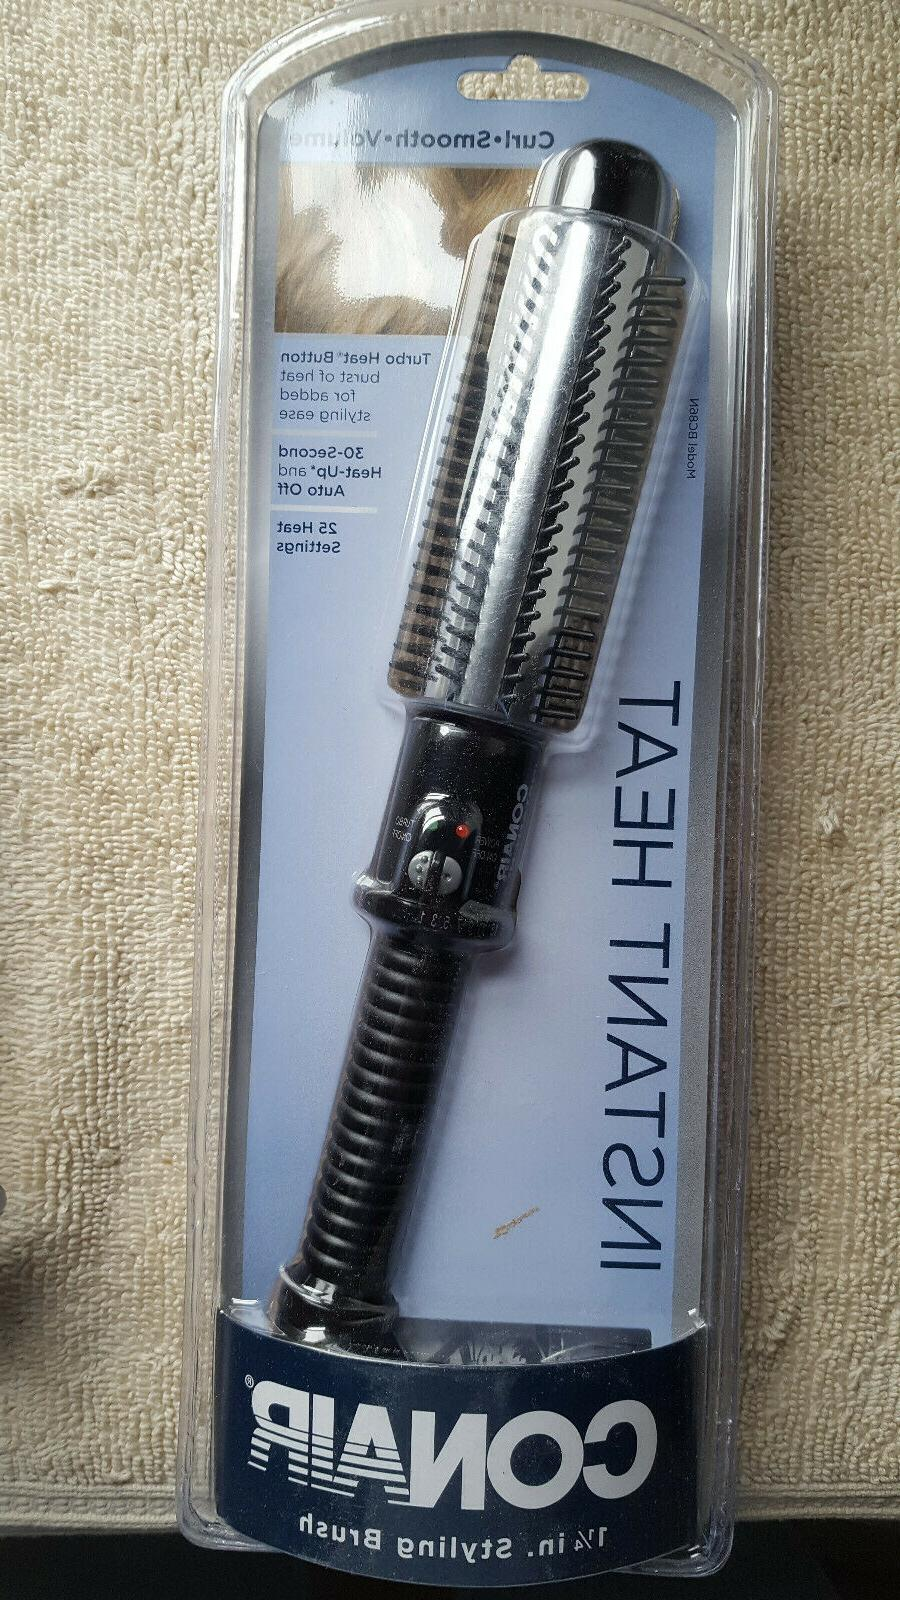 instant heat styling brush 1 1 4